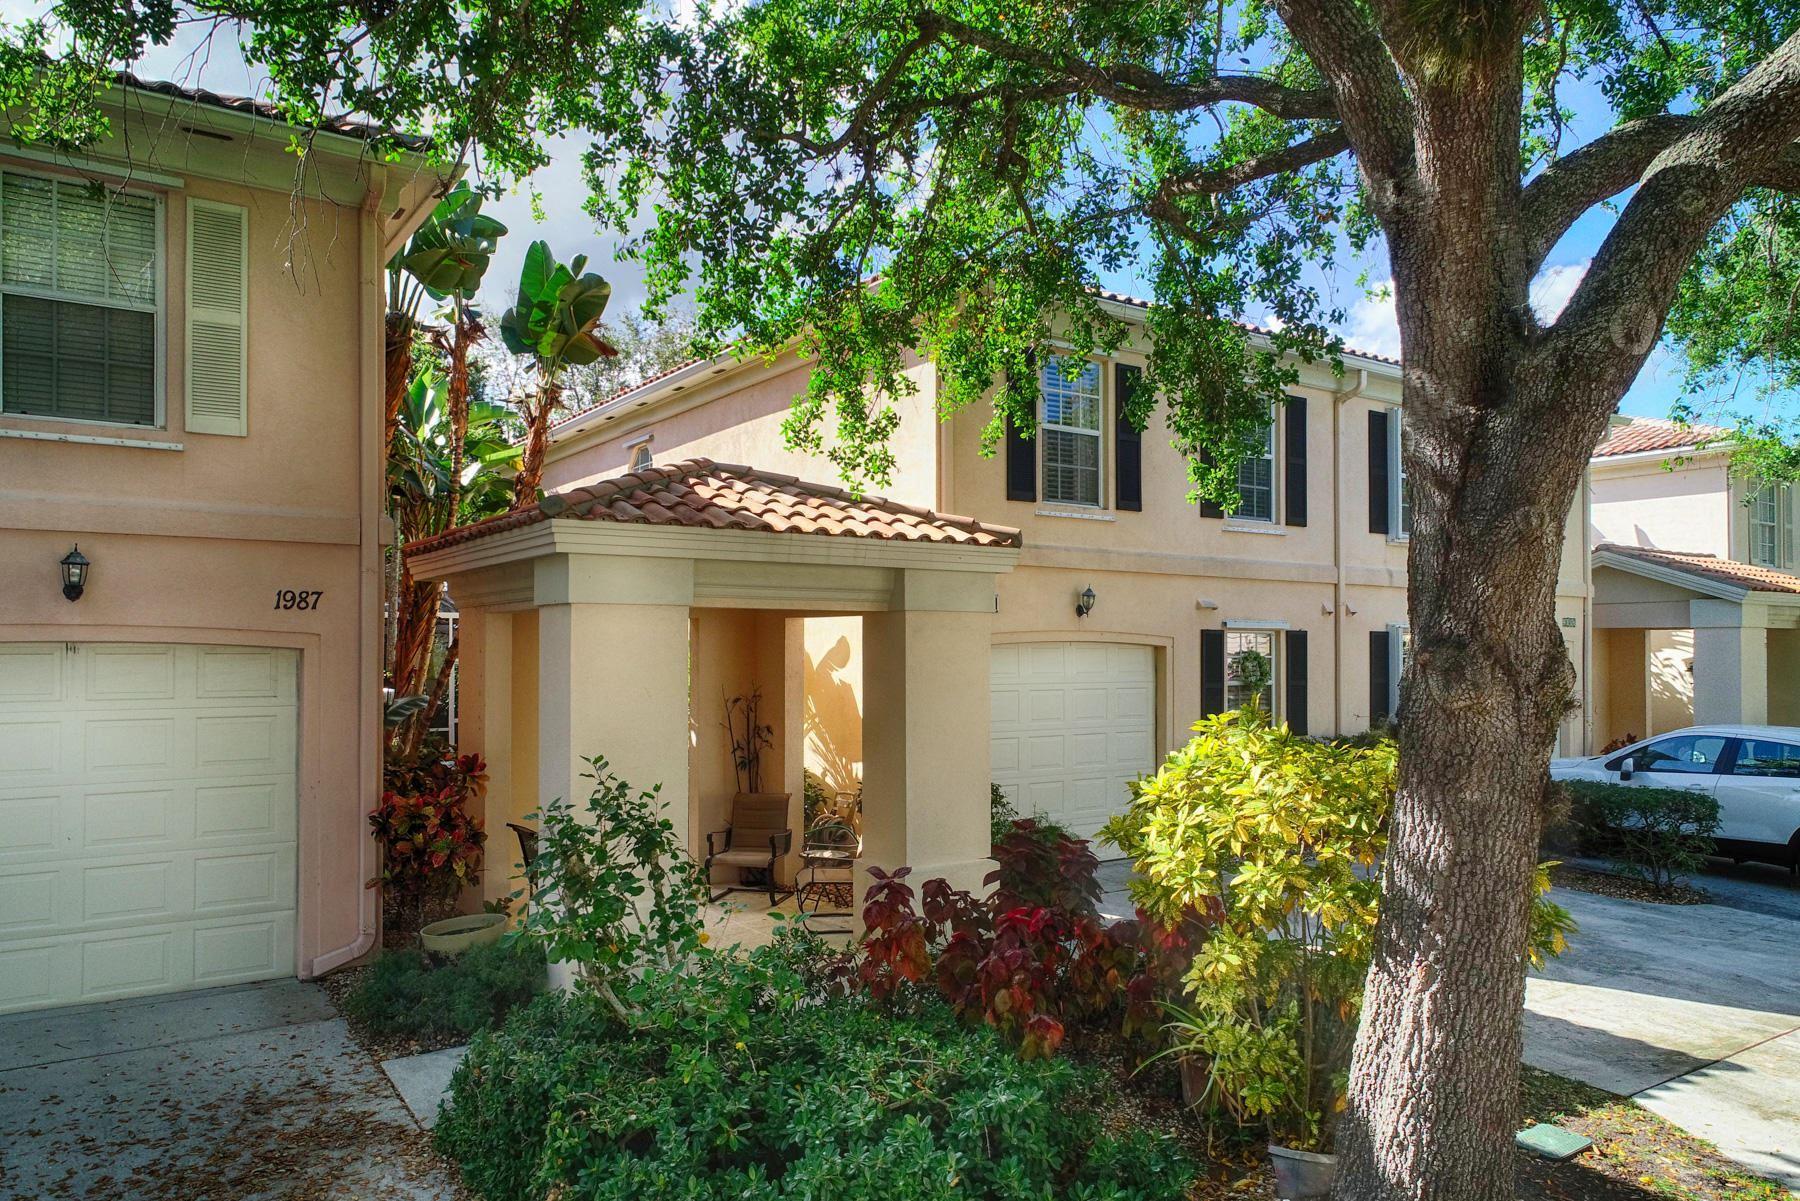 1997 Tigris Drive, West Palm Beach, FL 33411 - #: RX-10611582